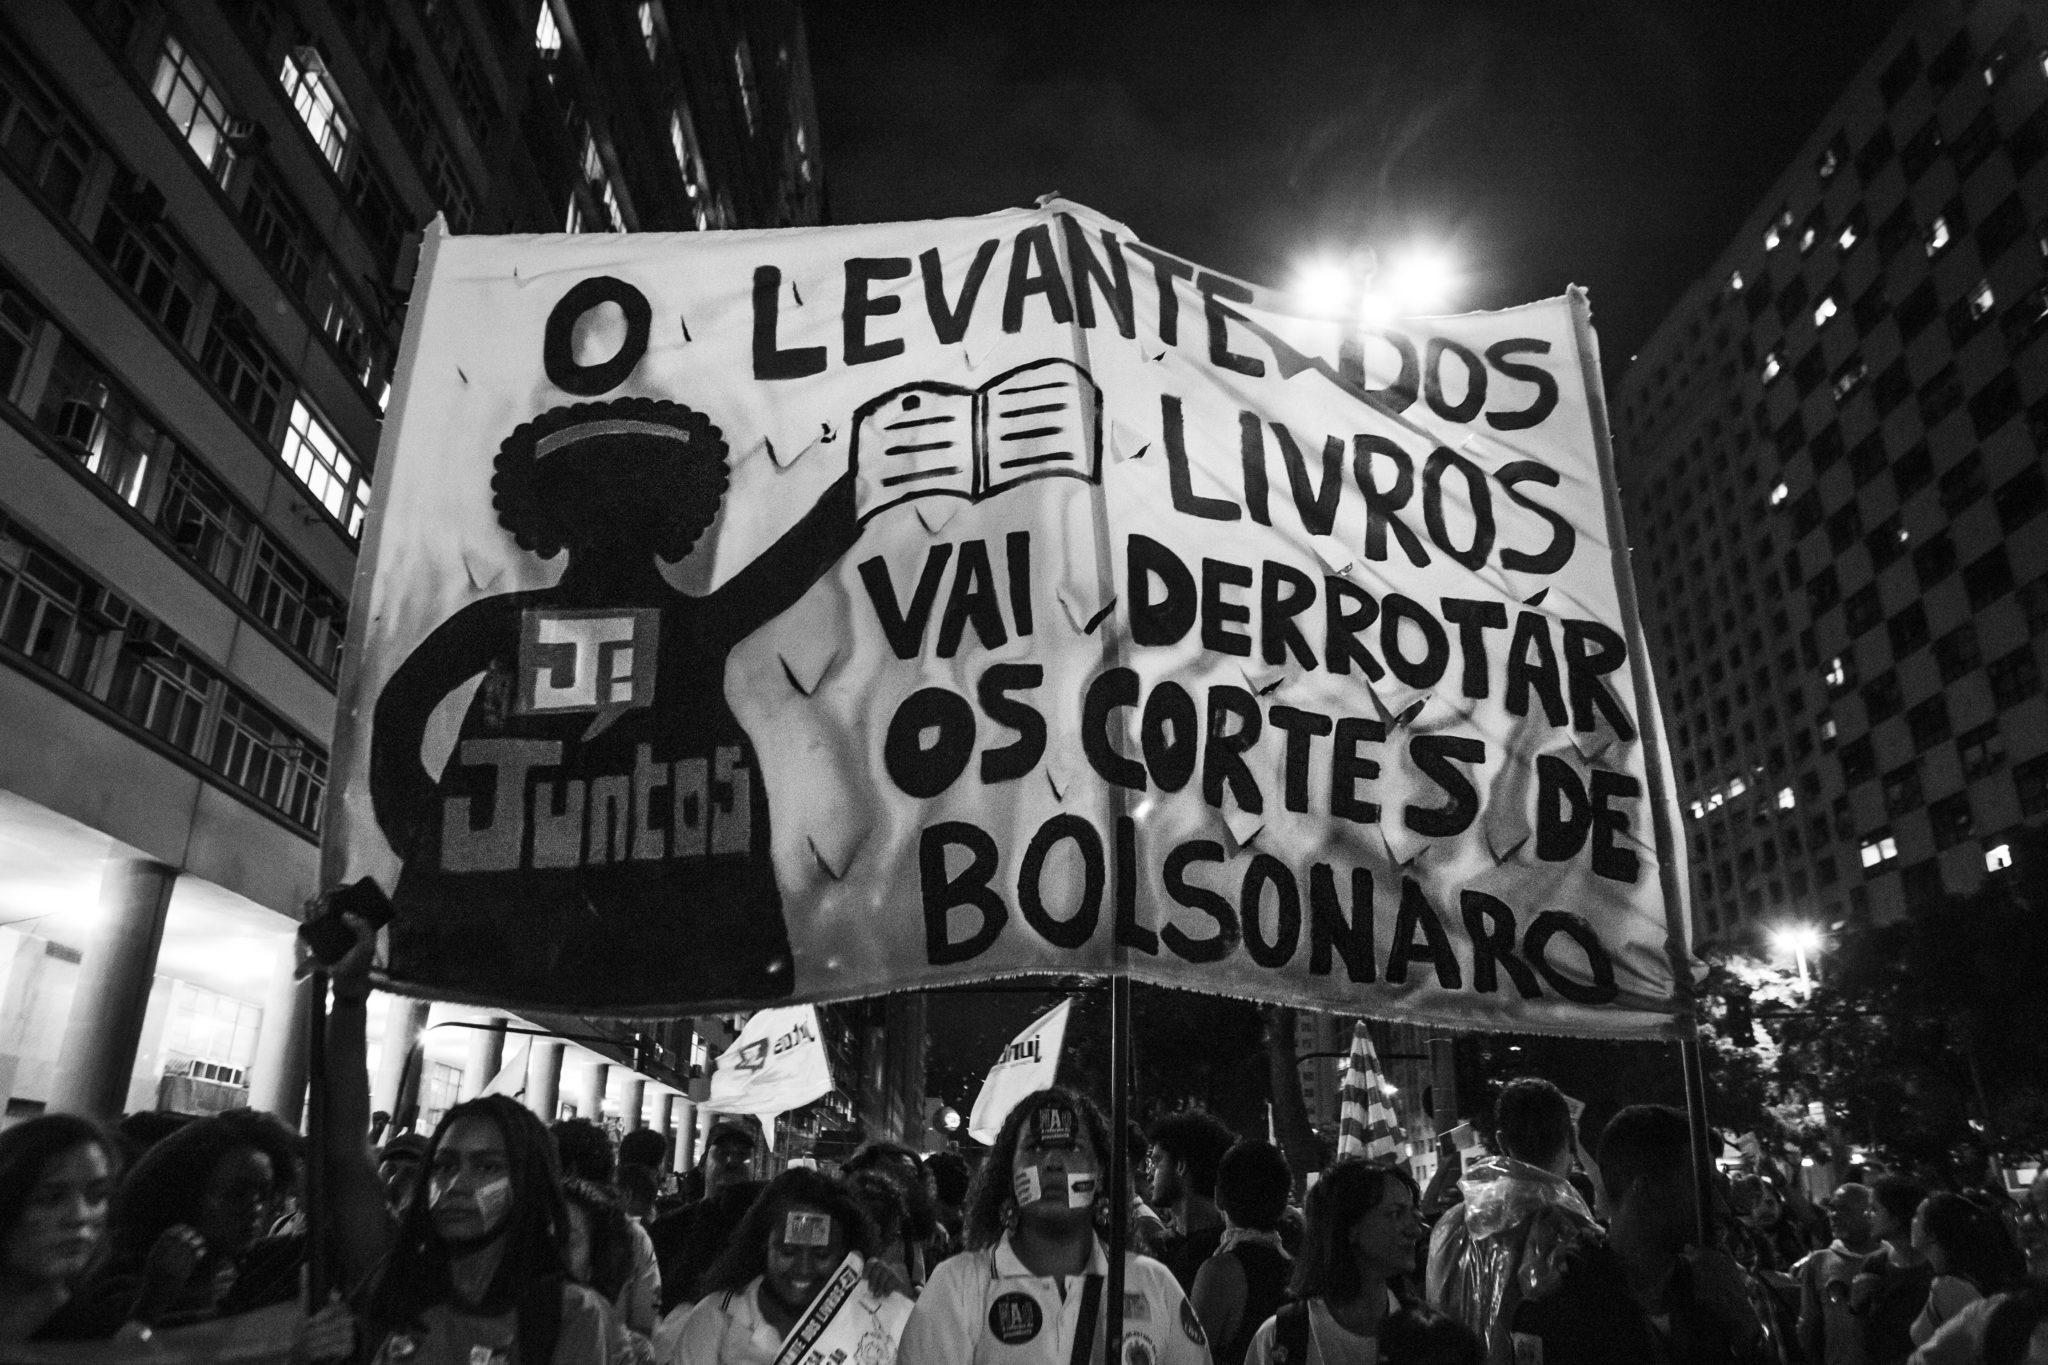 Bolsonaro Protests Brazil Education Cuts